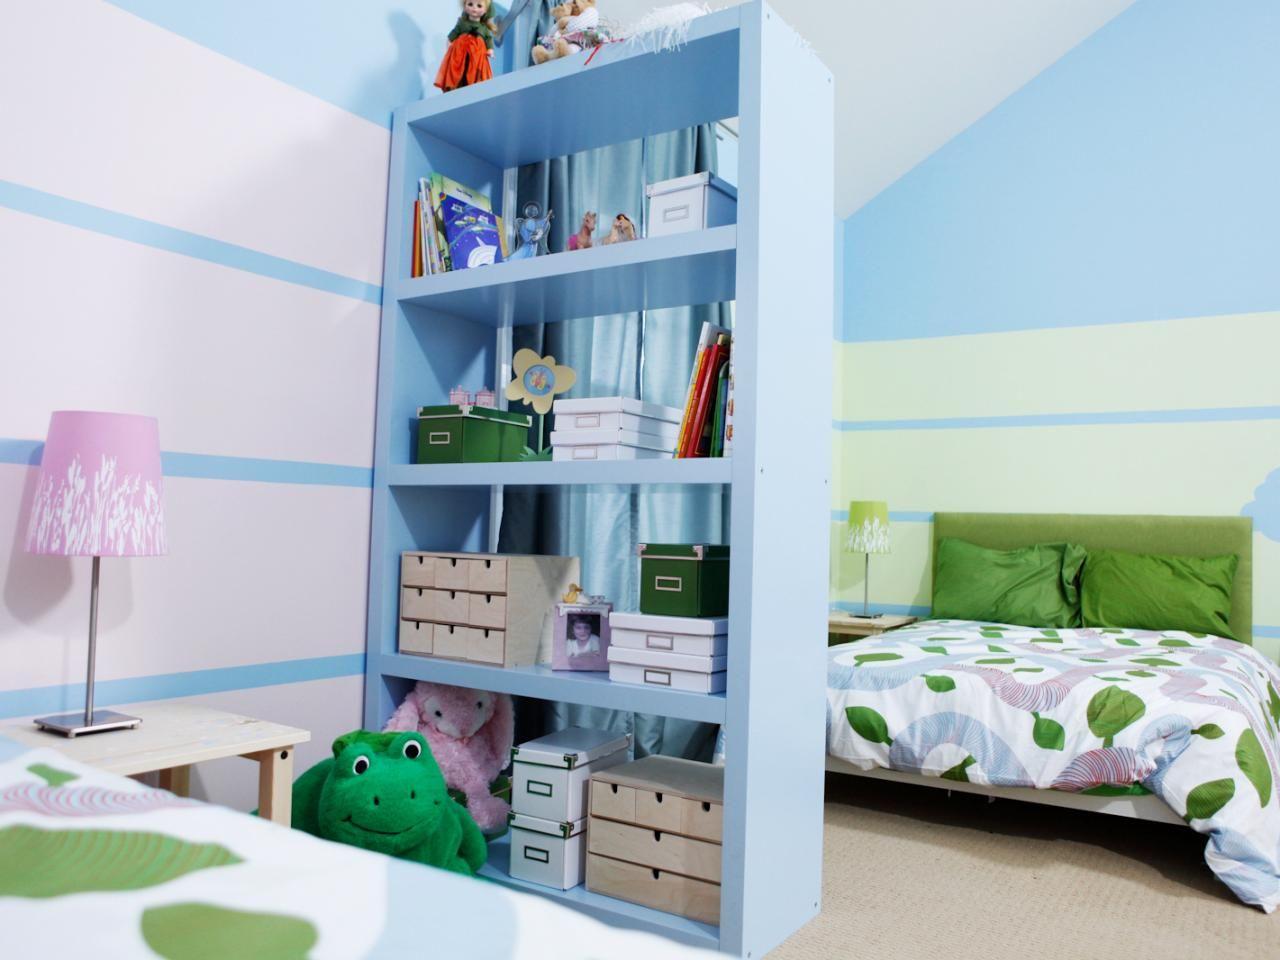 shared kids room design ideas ideas for teag s room kids room rh pinterest com